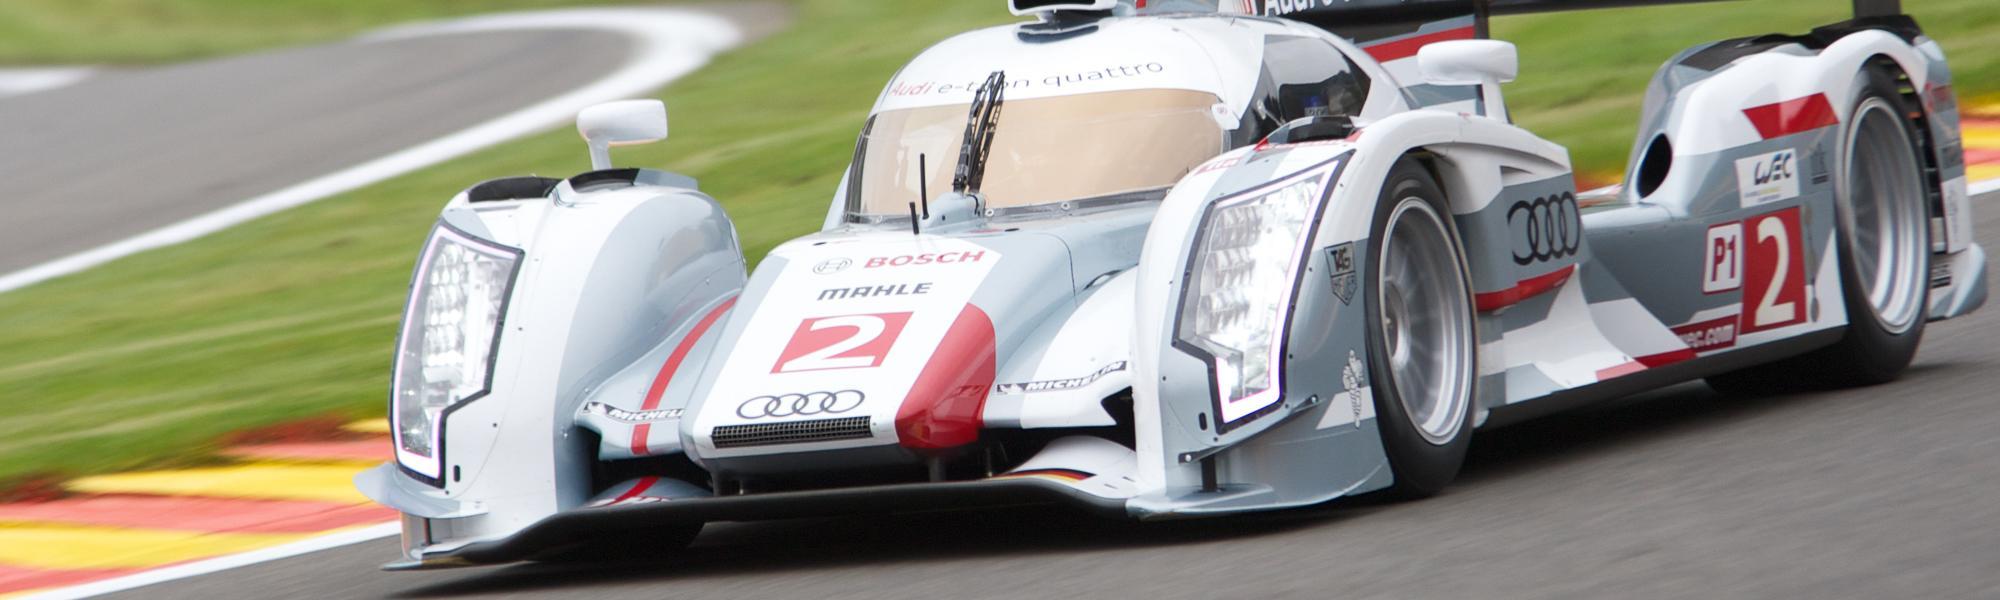 Carbon Motorsport Kunststoff Hintsteiner.jpg